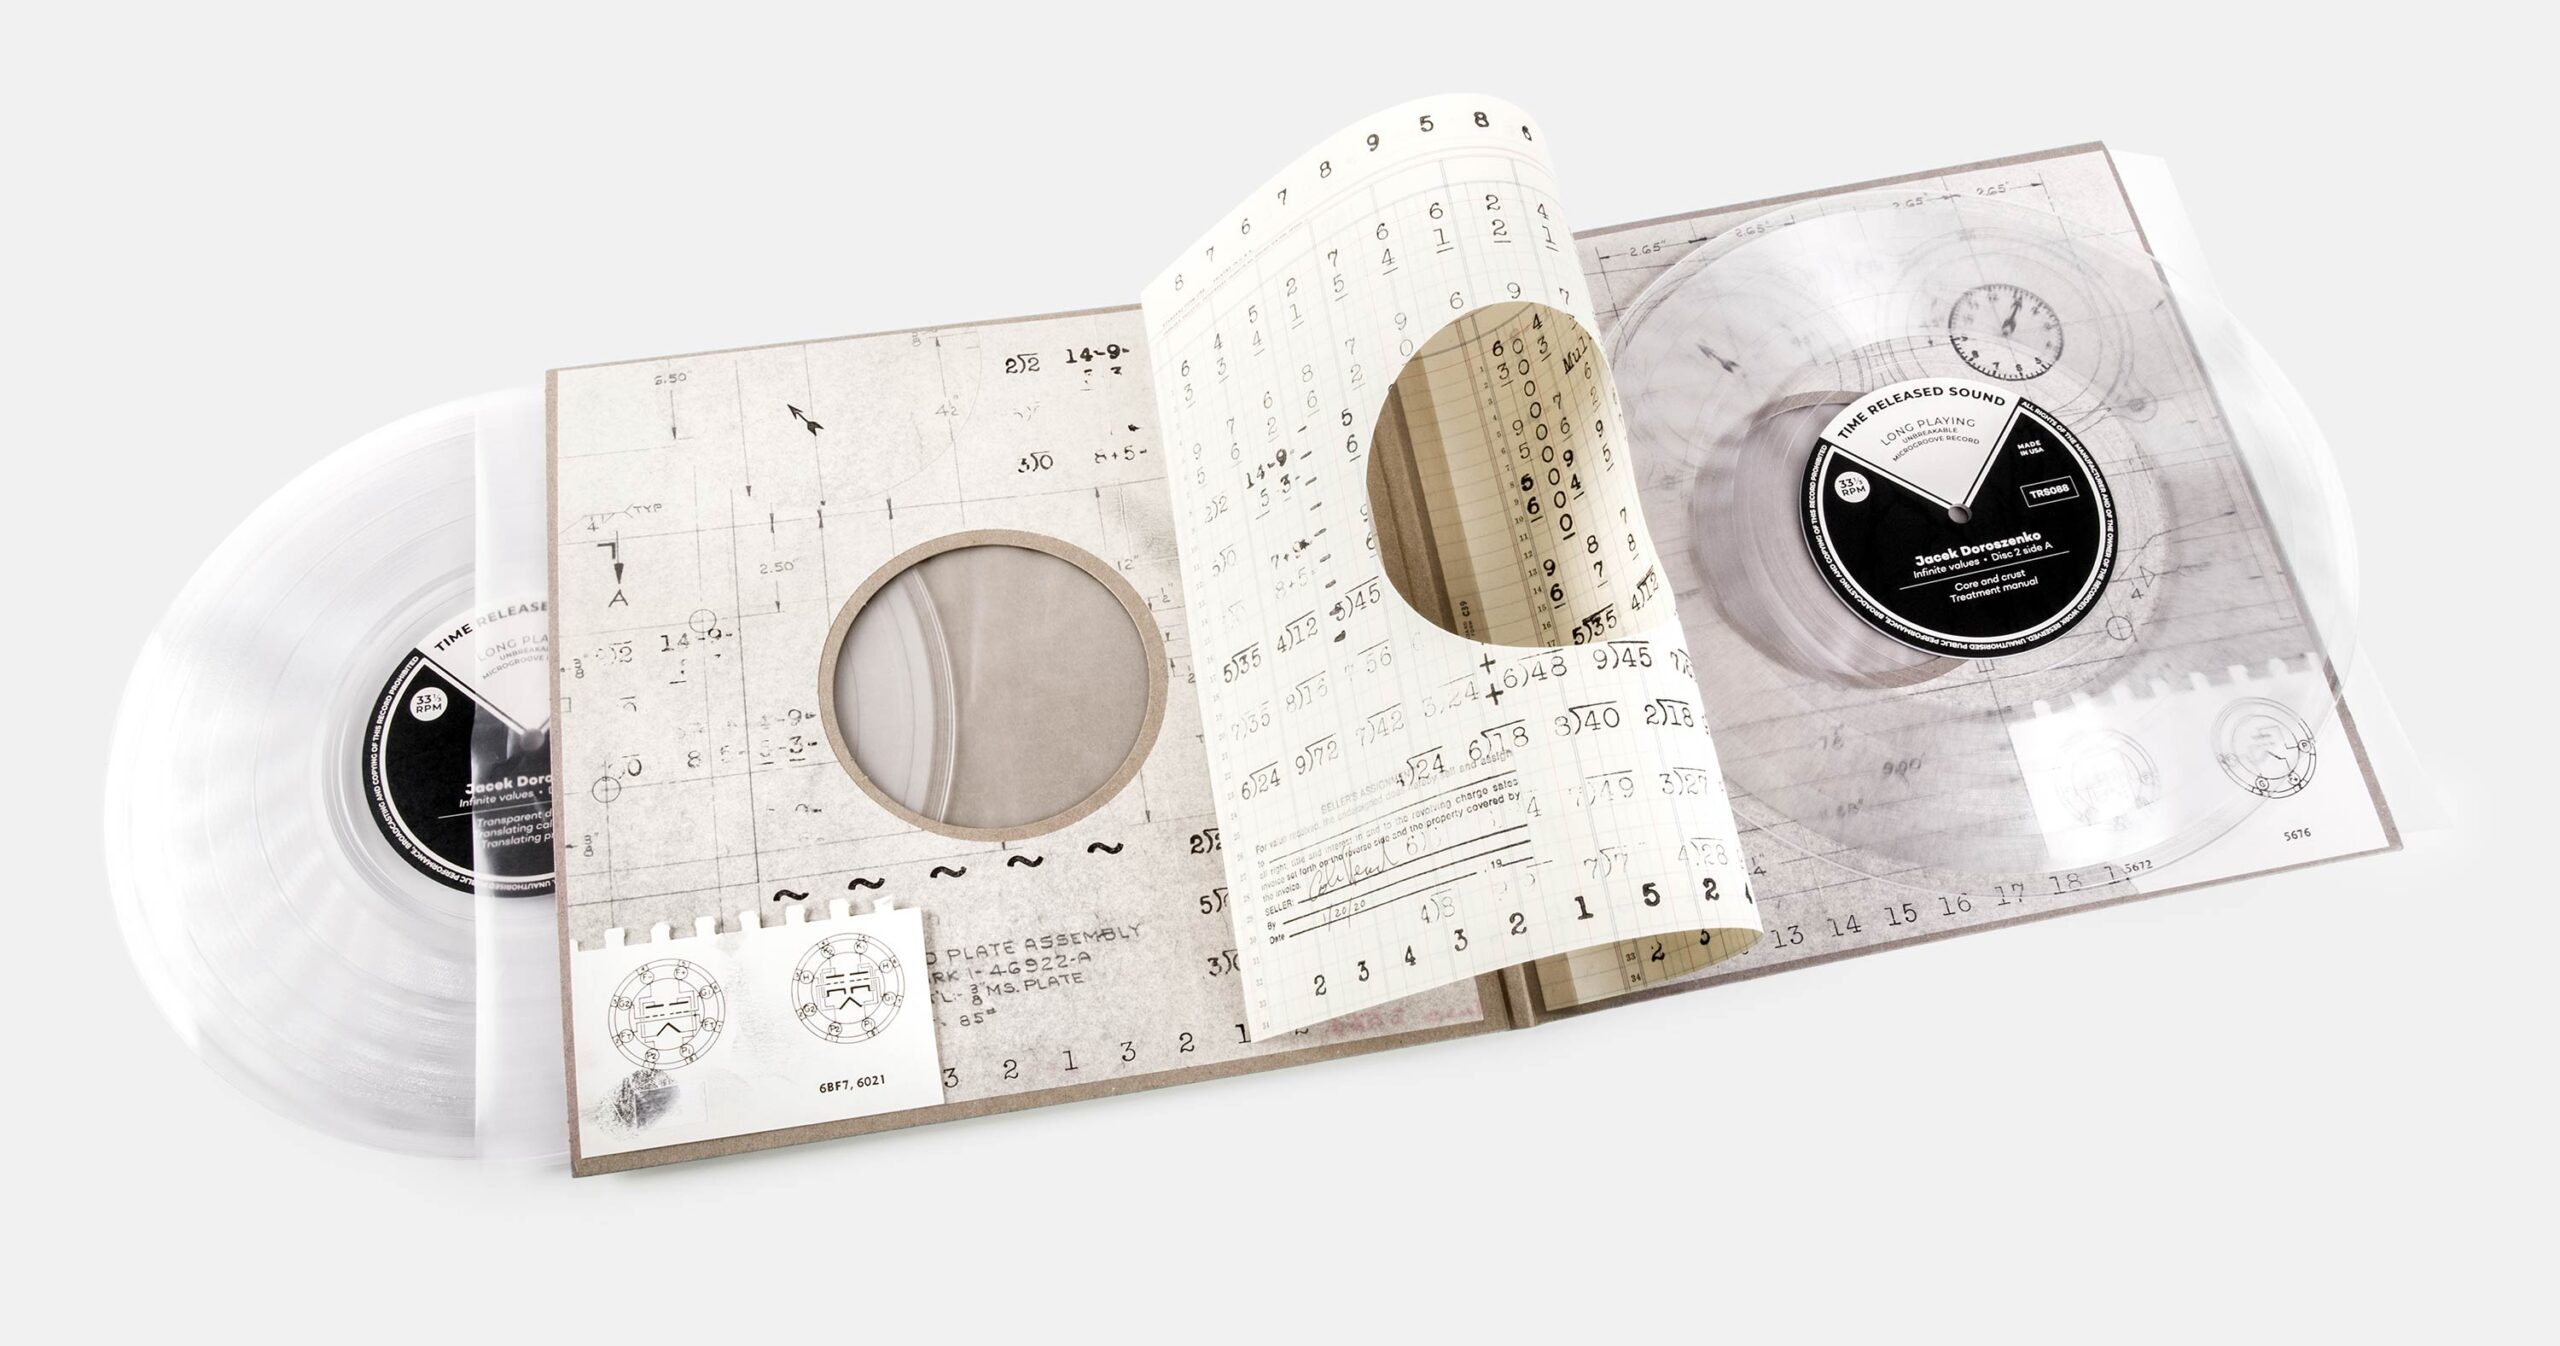 Jacek Doroszenko - Infinite Values, contemporary music album 04